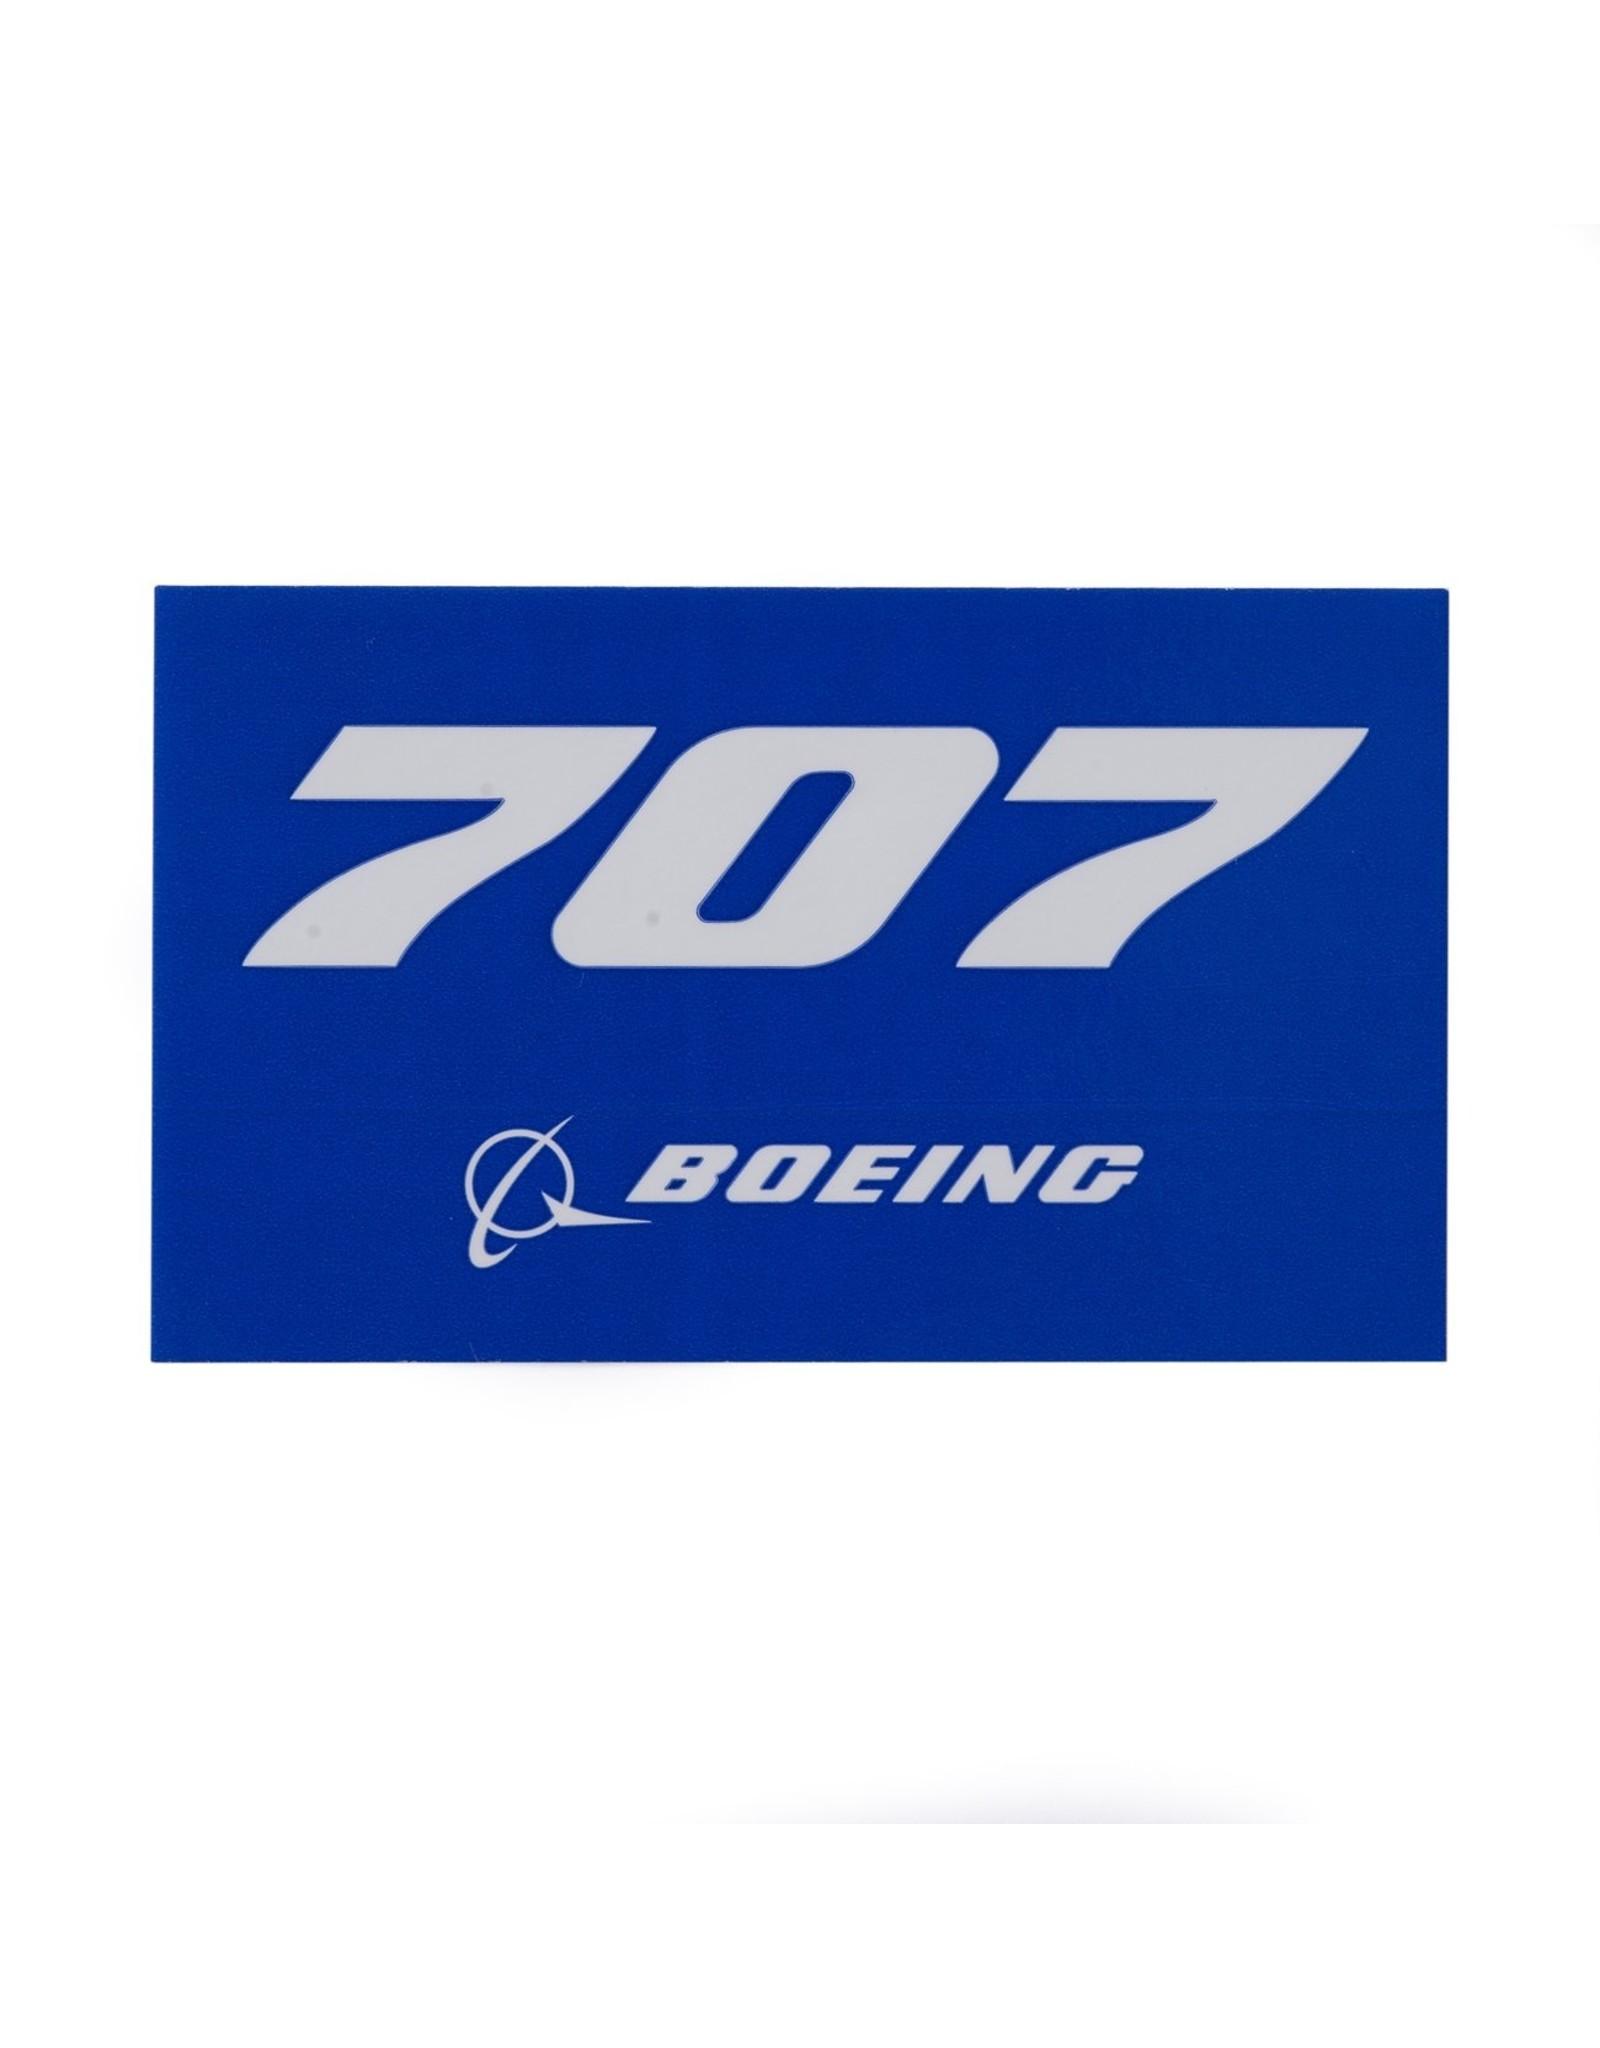 Sticker 707 rectangle